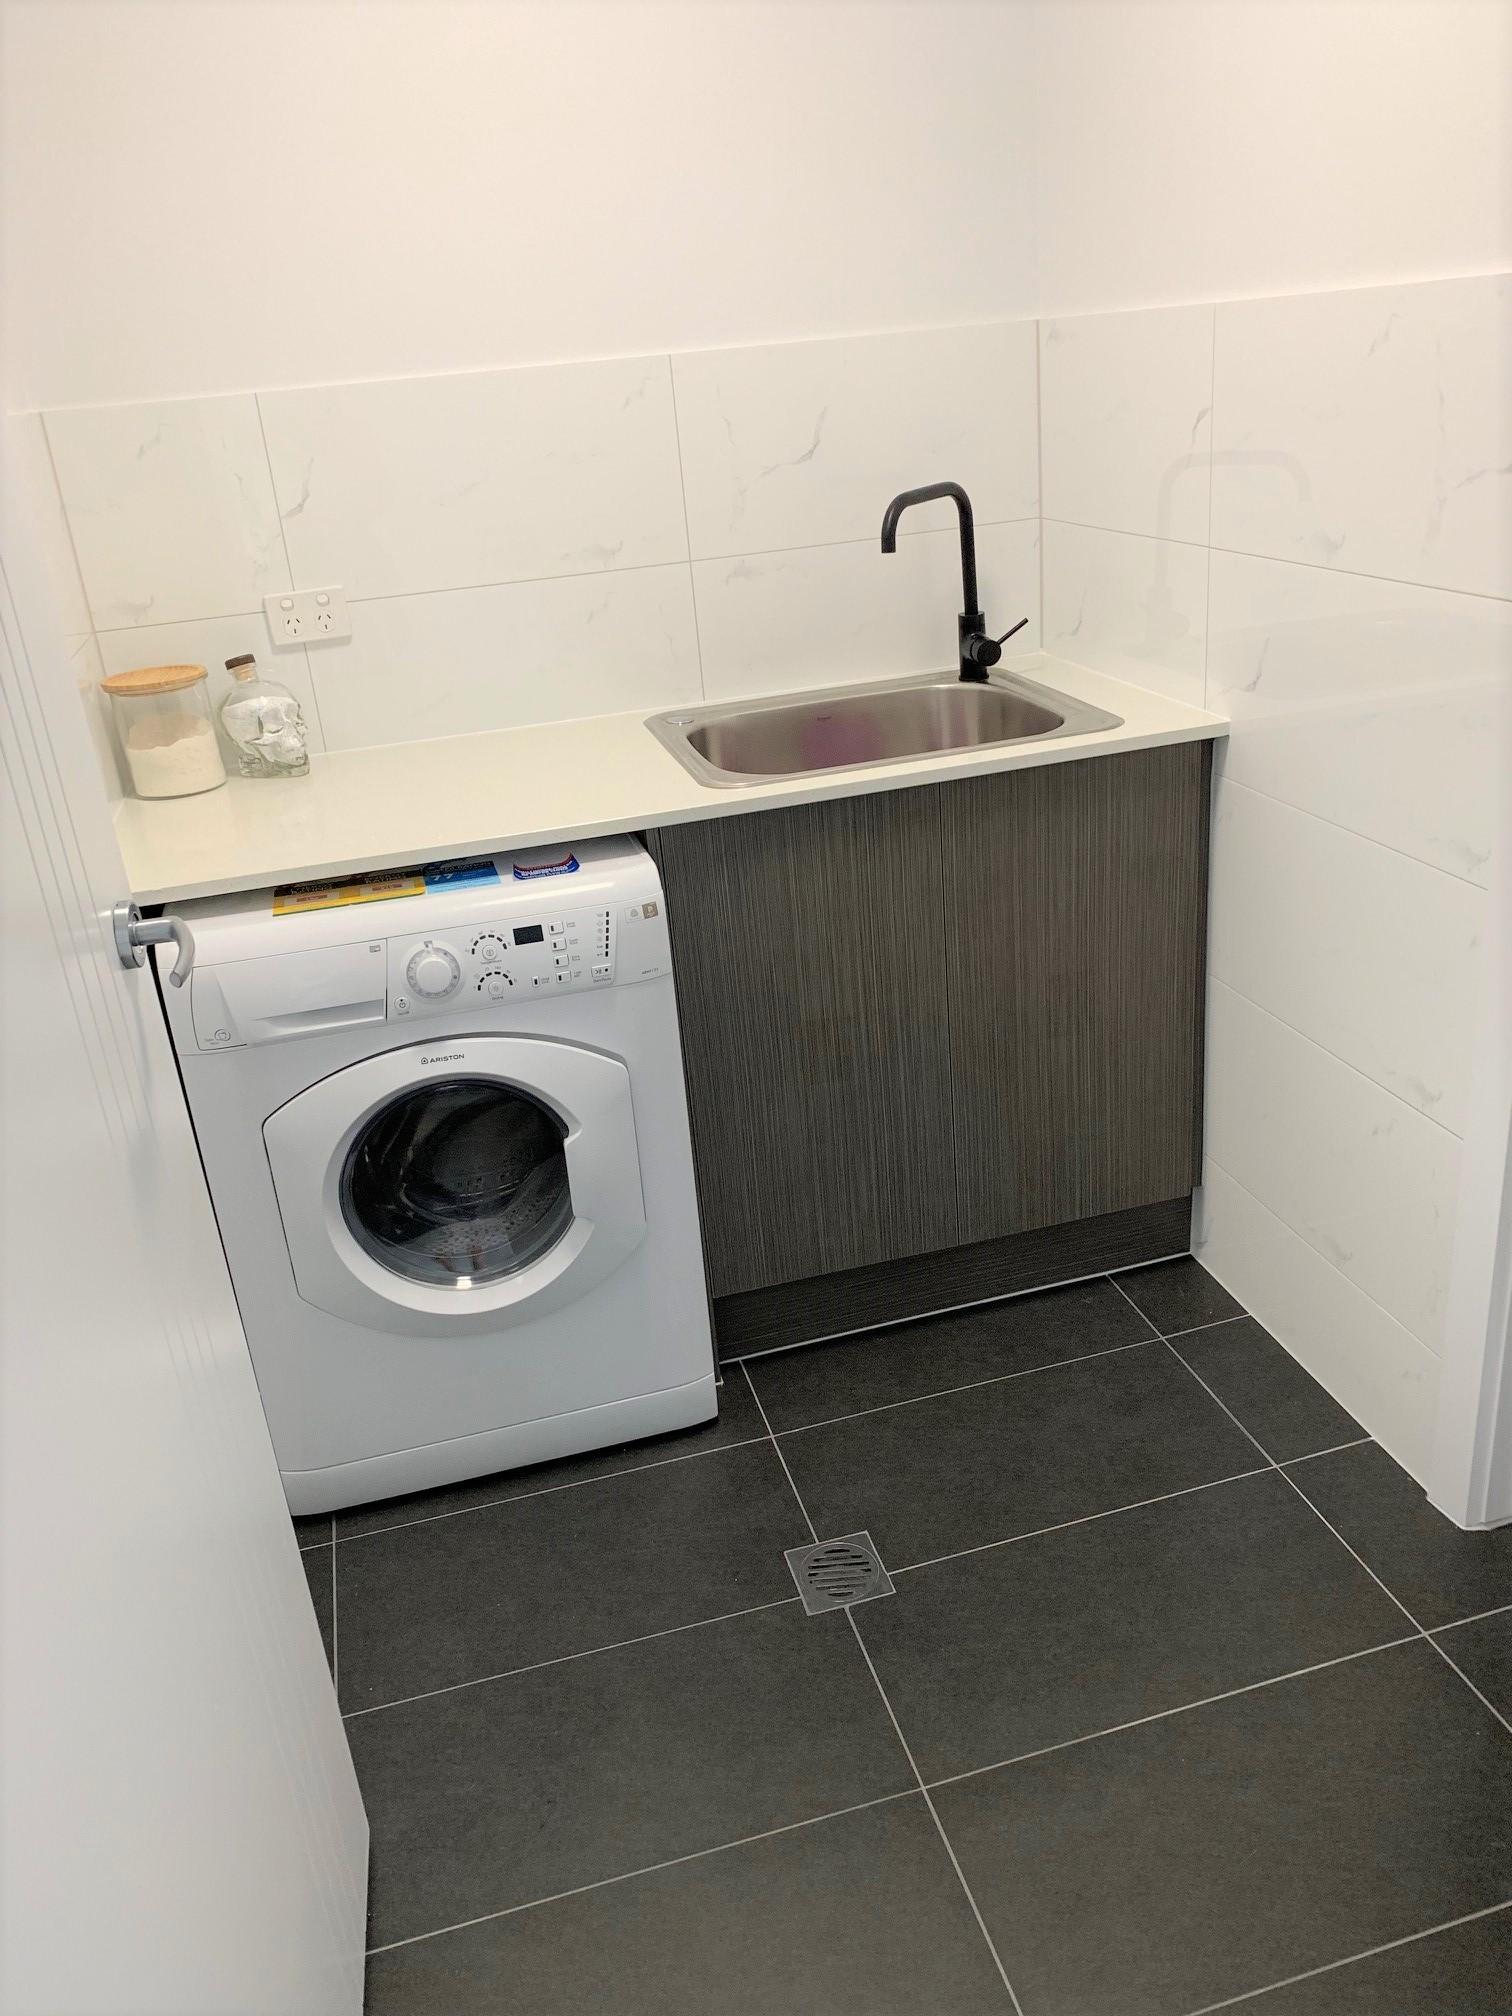 mydimport-1596538635-hires.723-laundry.jpg